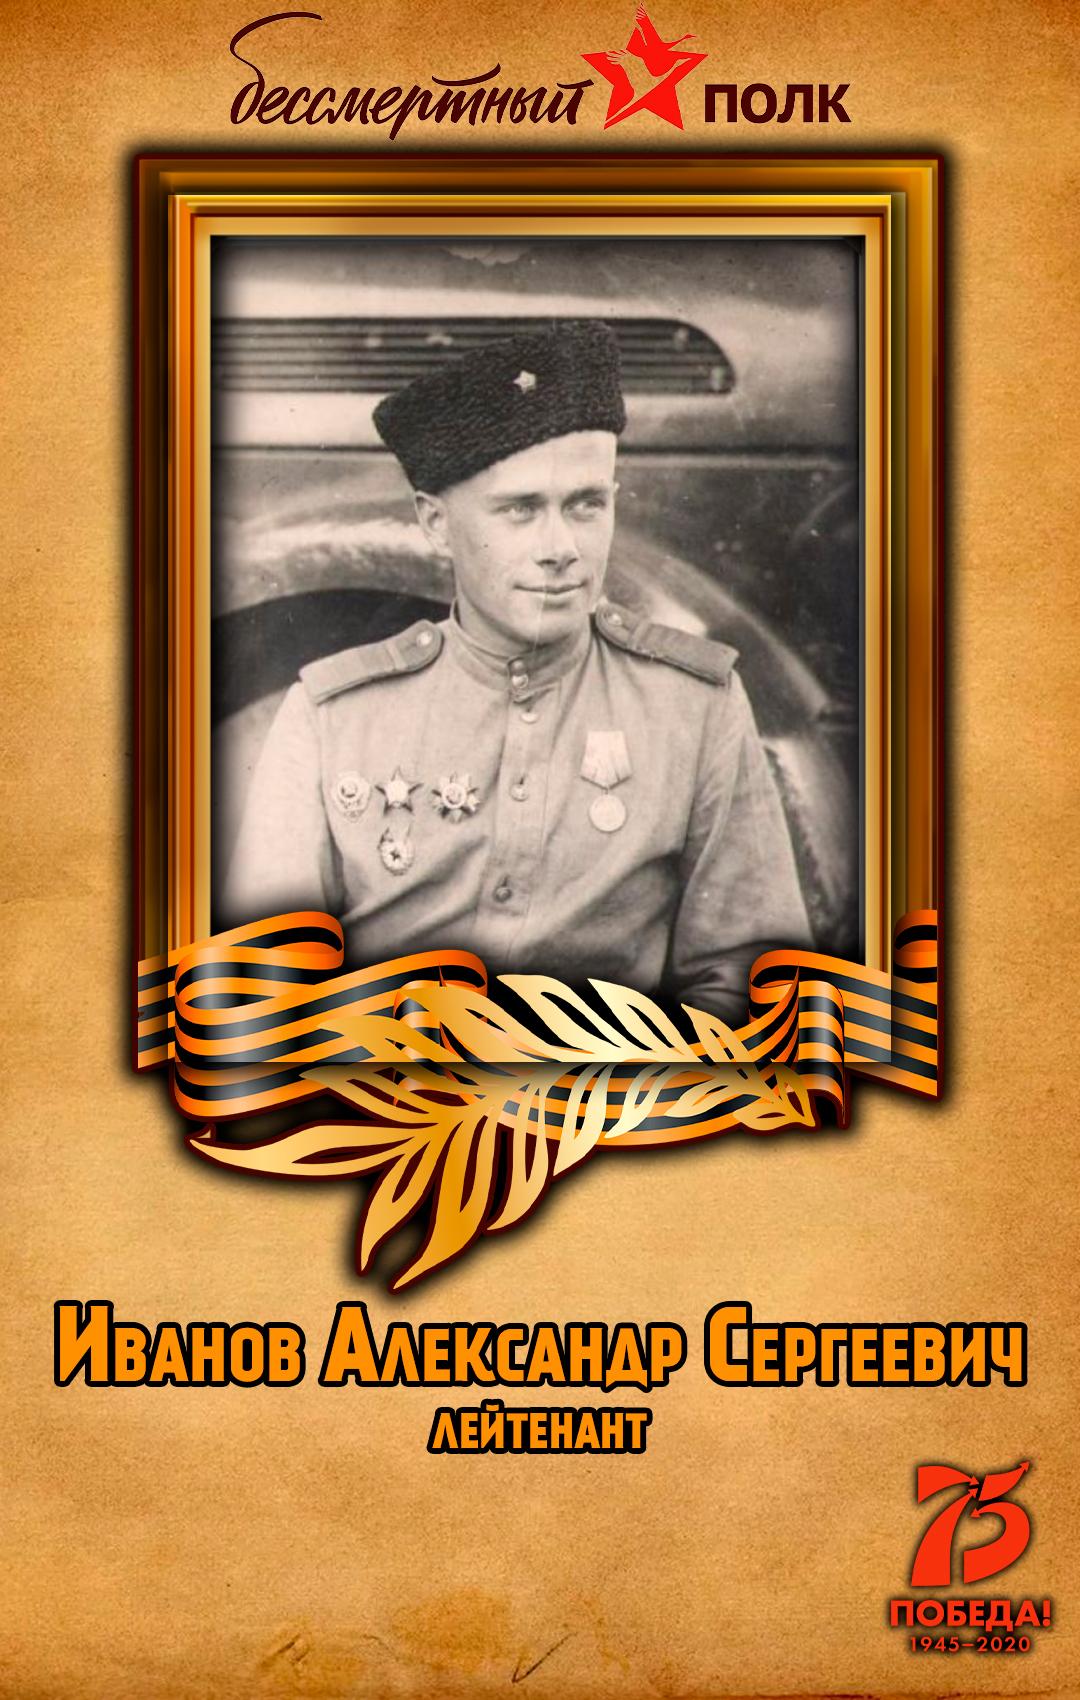 Иванов-Александр-Сергеевич